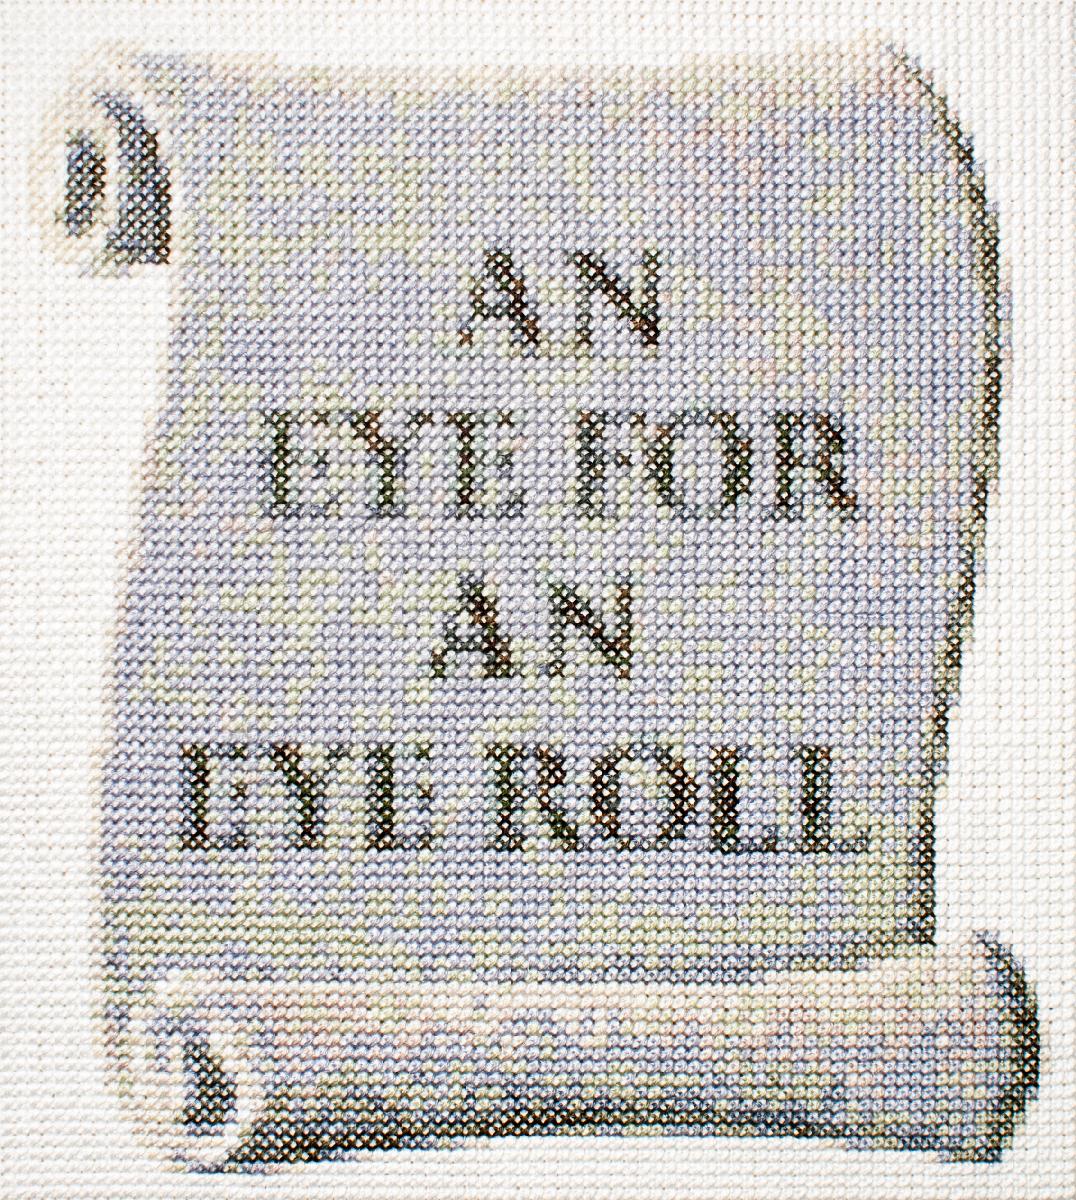 AN EYE FOR AN EYE ROLL   Cotton thread on aida cloth  8.2 x 7.25 inches  2017